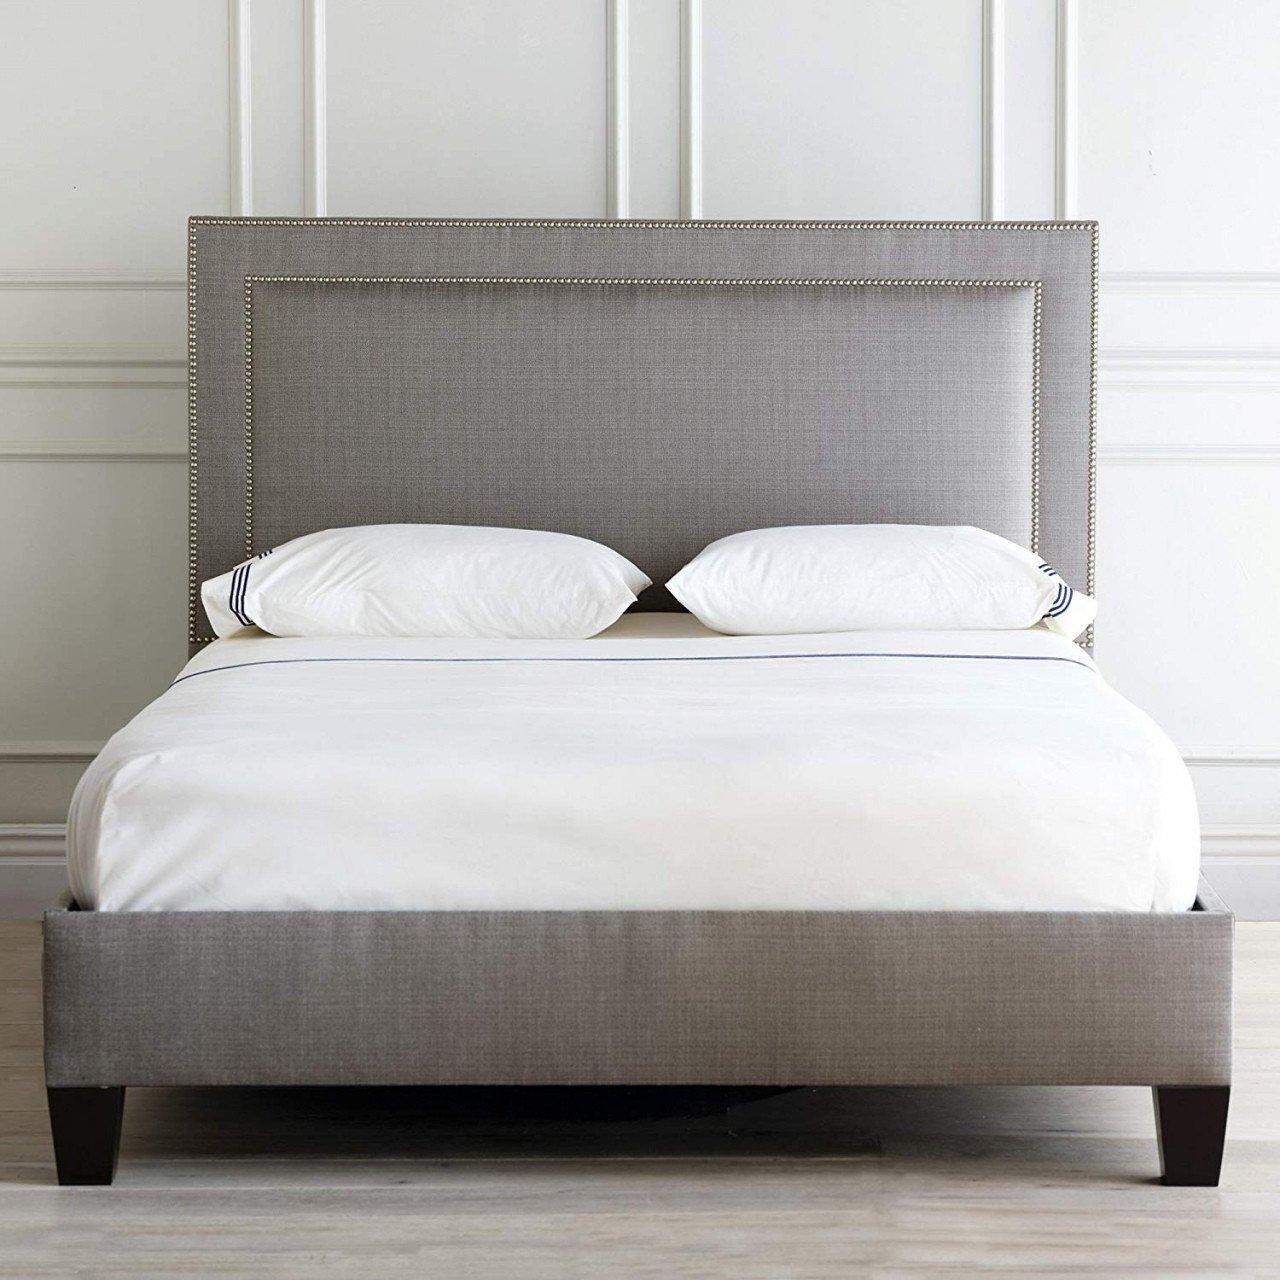 Bedroom Furniture Set King Beautiful King Metal Platform Bed — Procura Home Blog